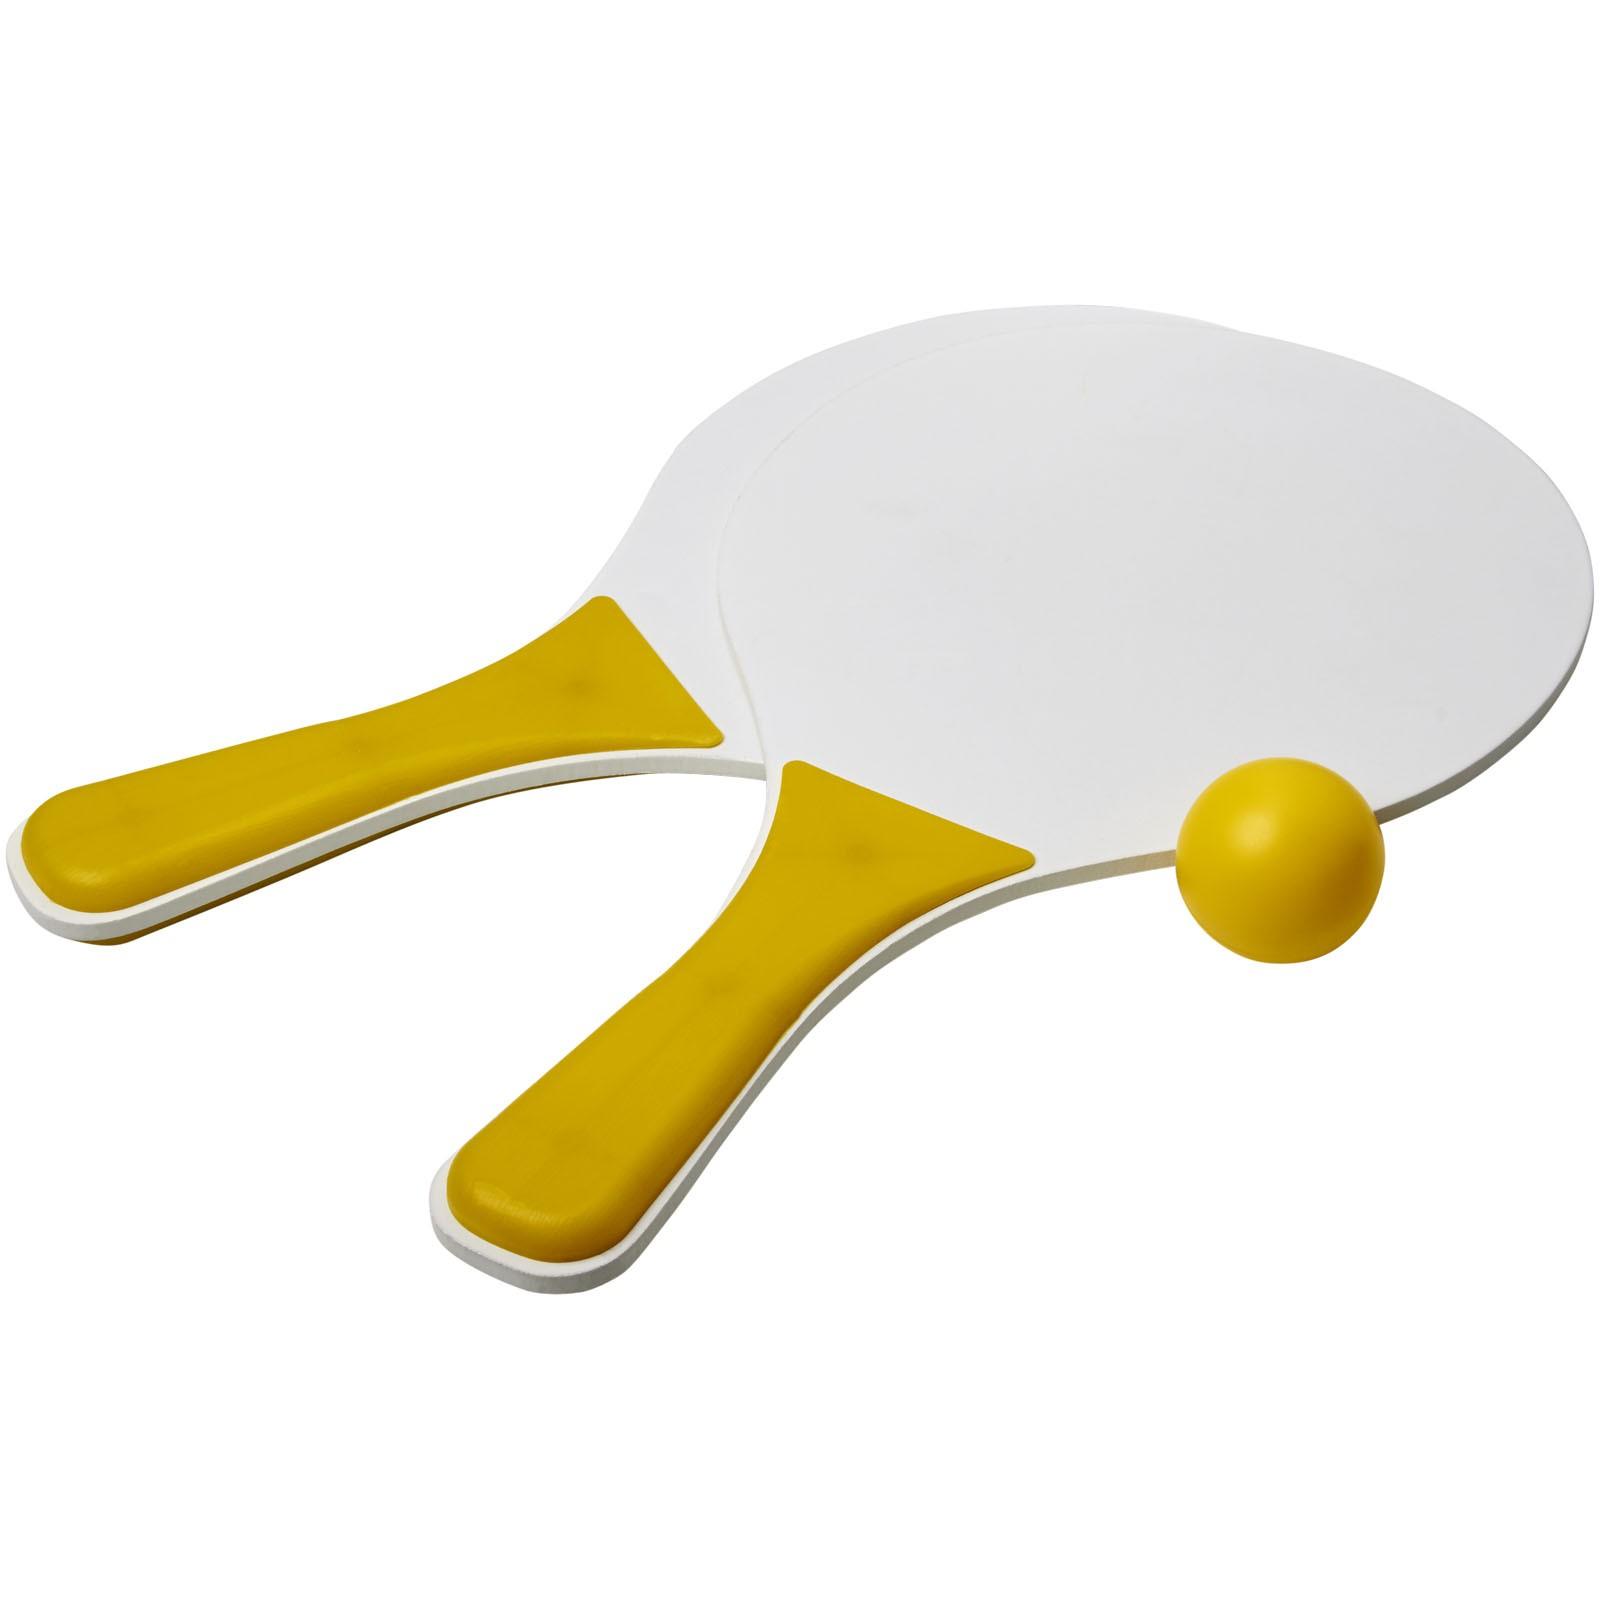 Bounce plážová herní sada - Žlutá / Bílá